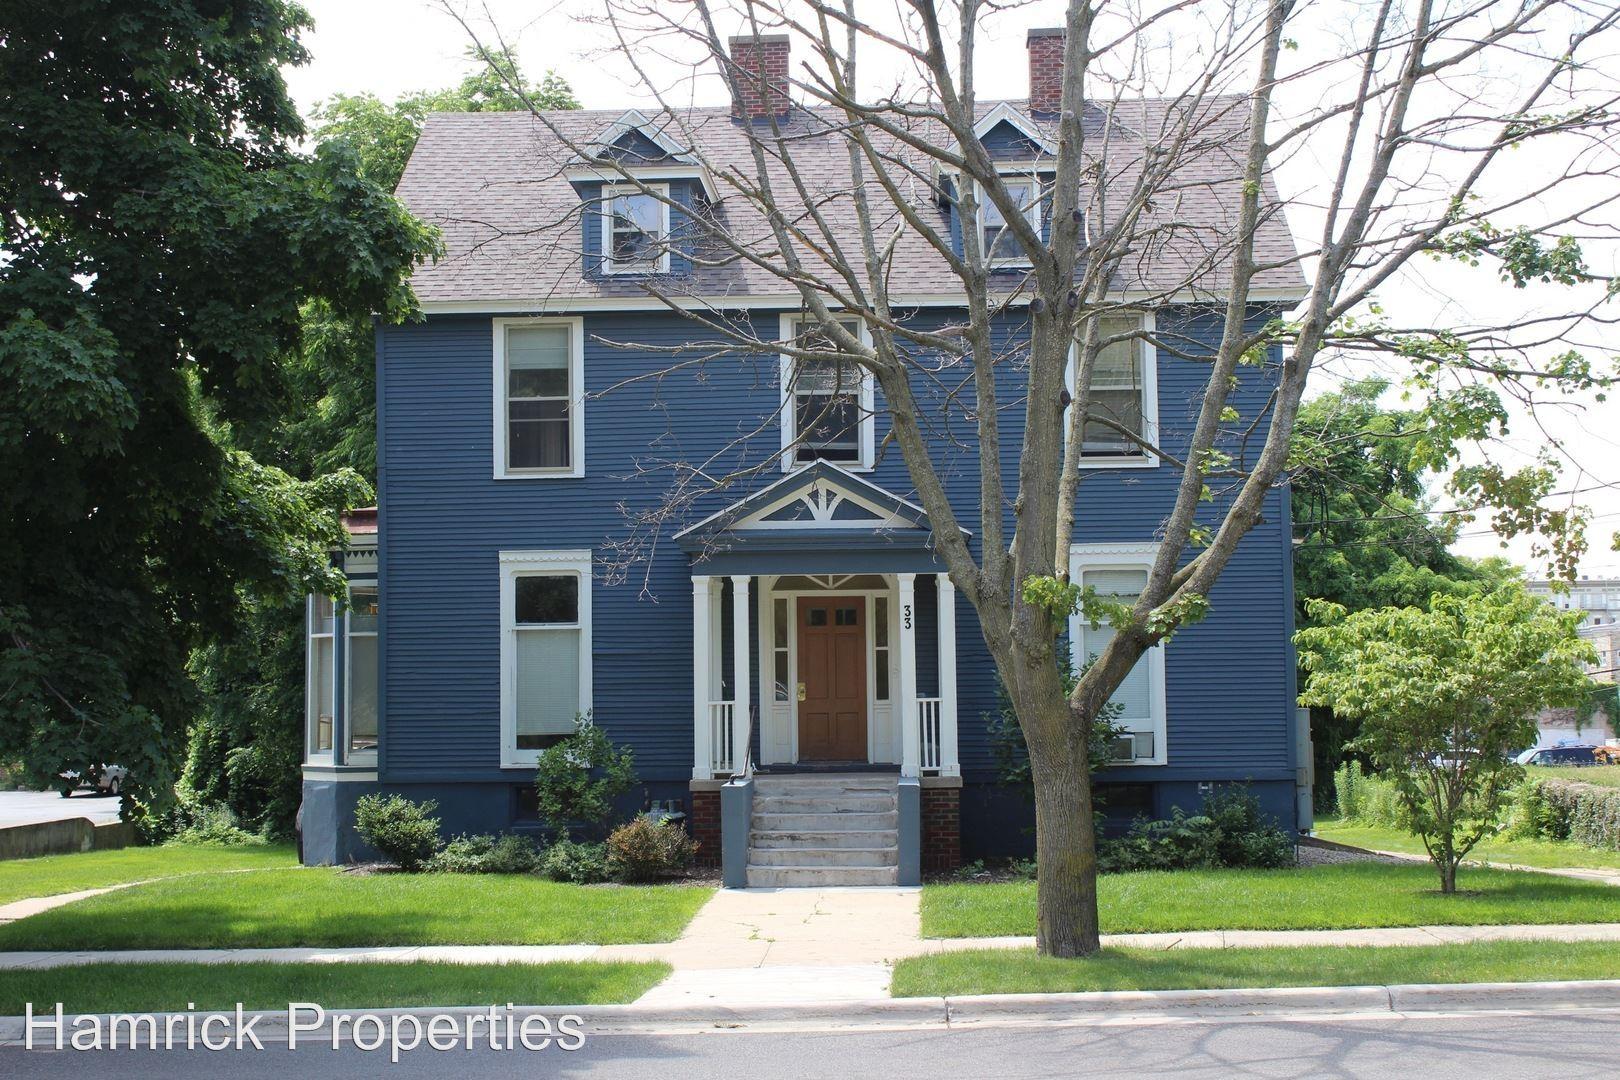 33 Lafayette Ave SE, Grand Rapids, MI 49503 1 Bedroom